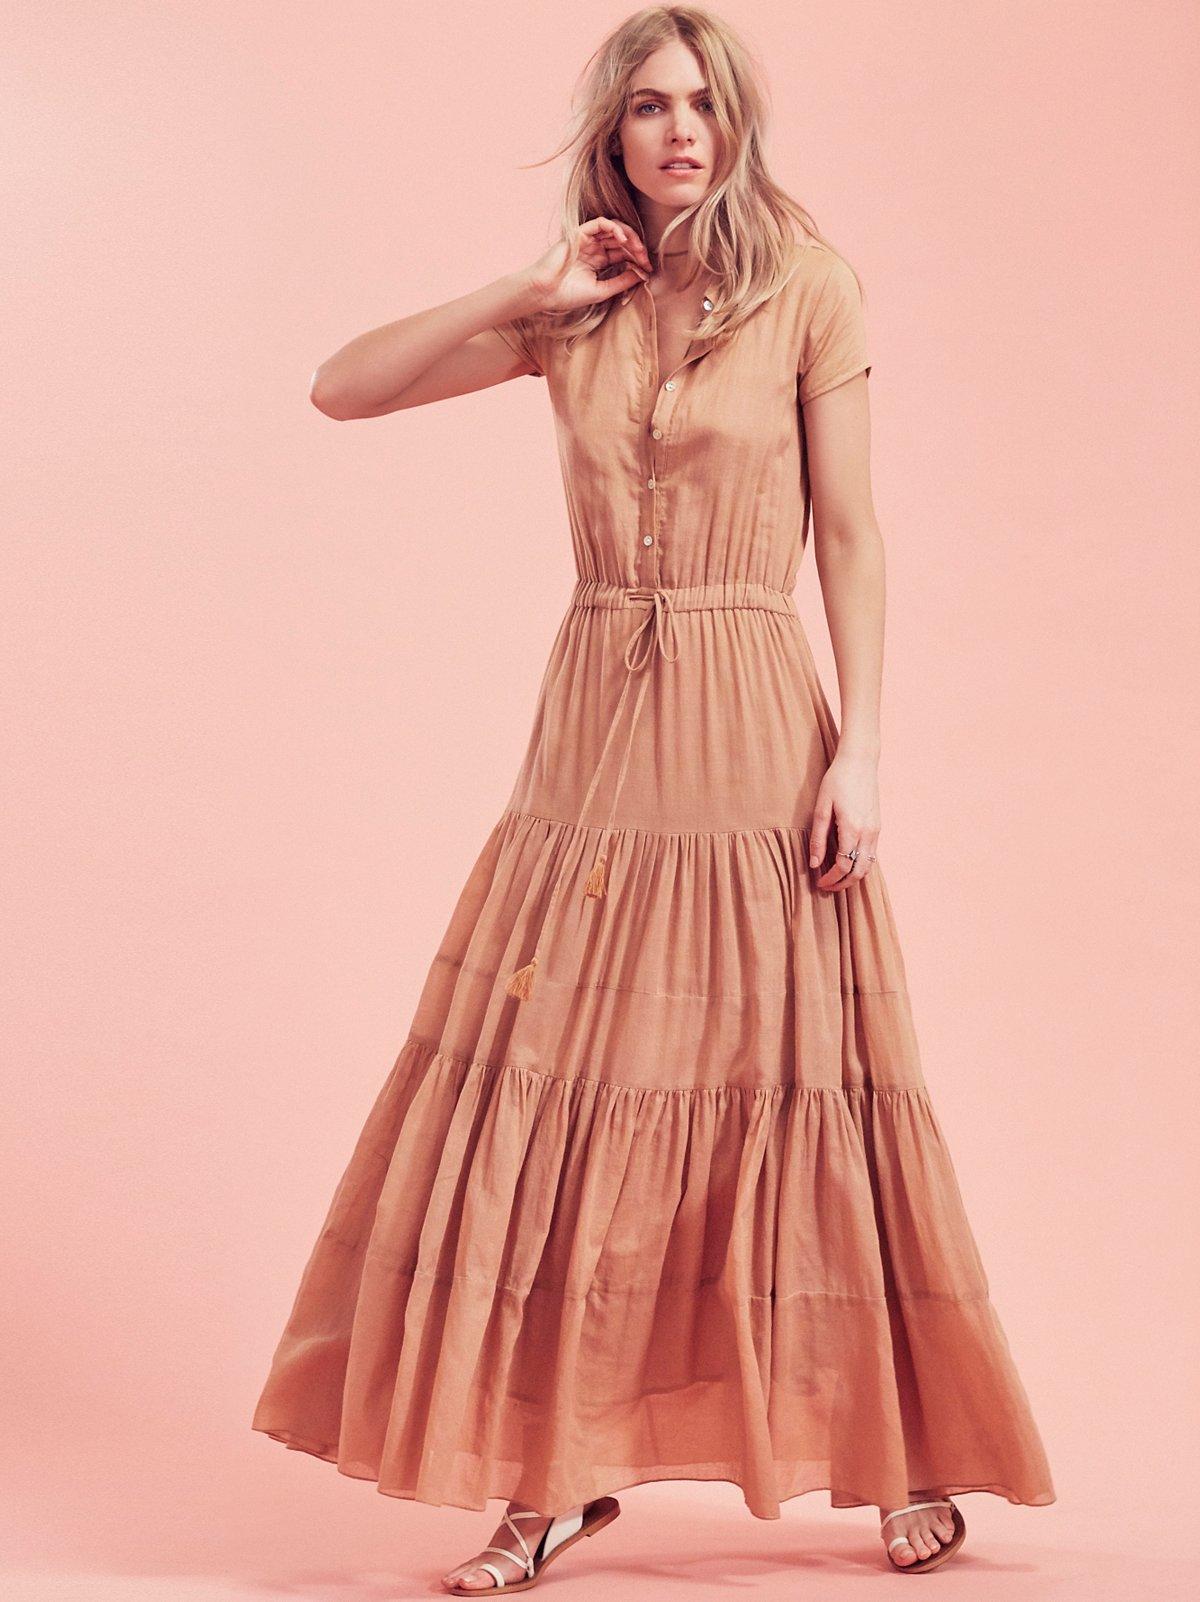 Nathalie短袖连衣裙